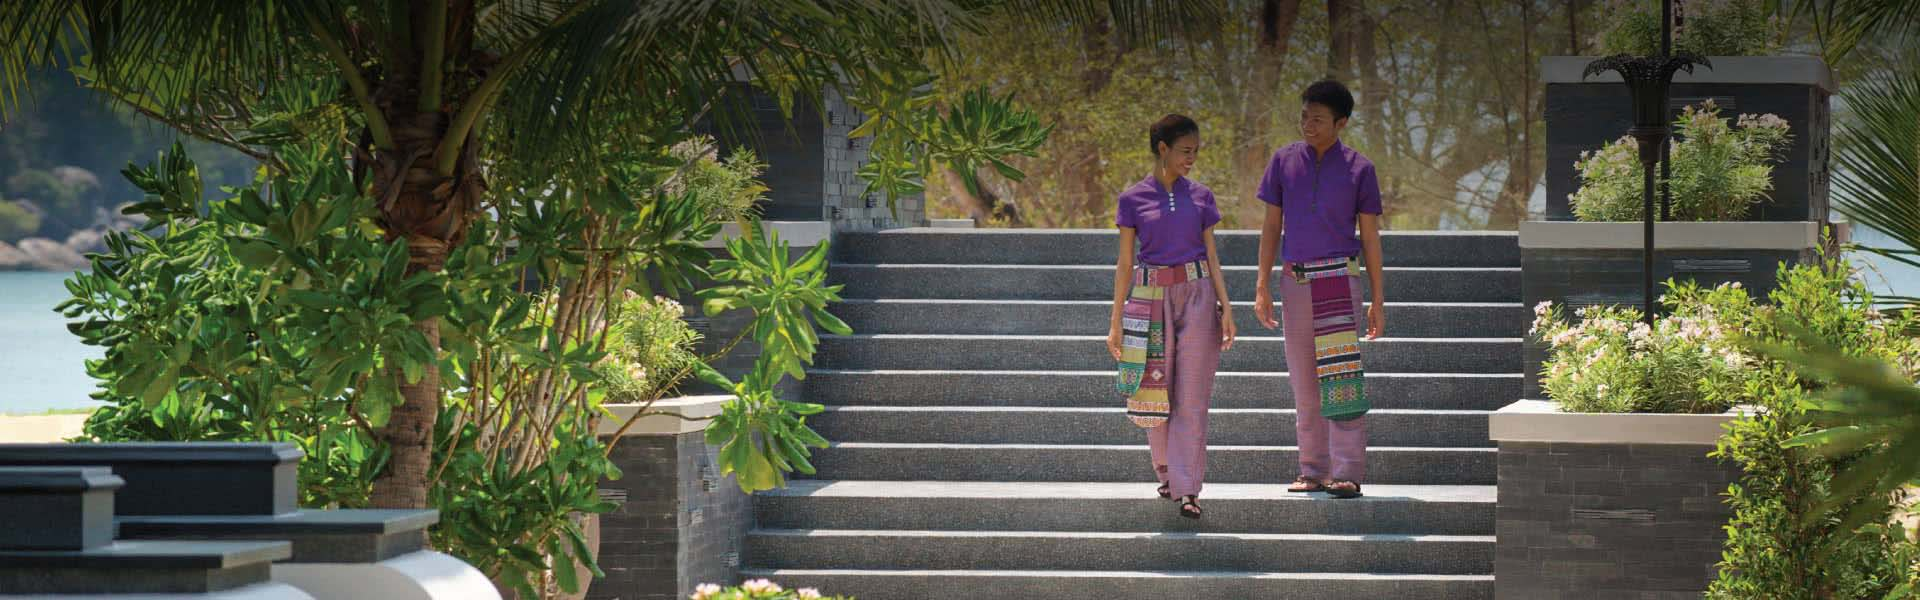 5 Star Resort Phuket | Anantara Layan Phuket Luxury Resort